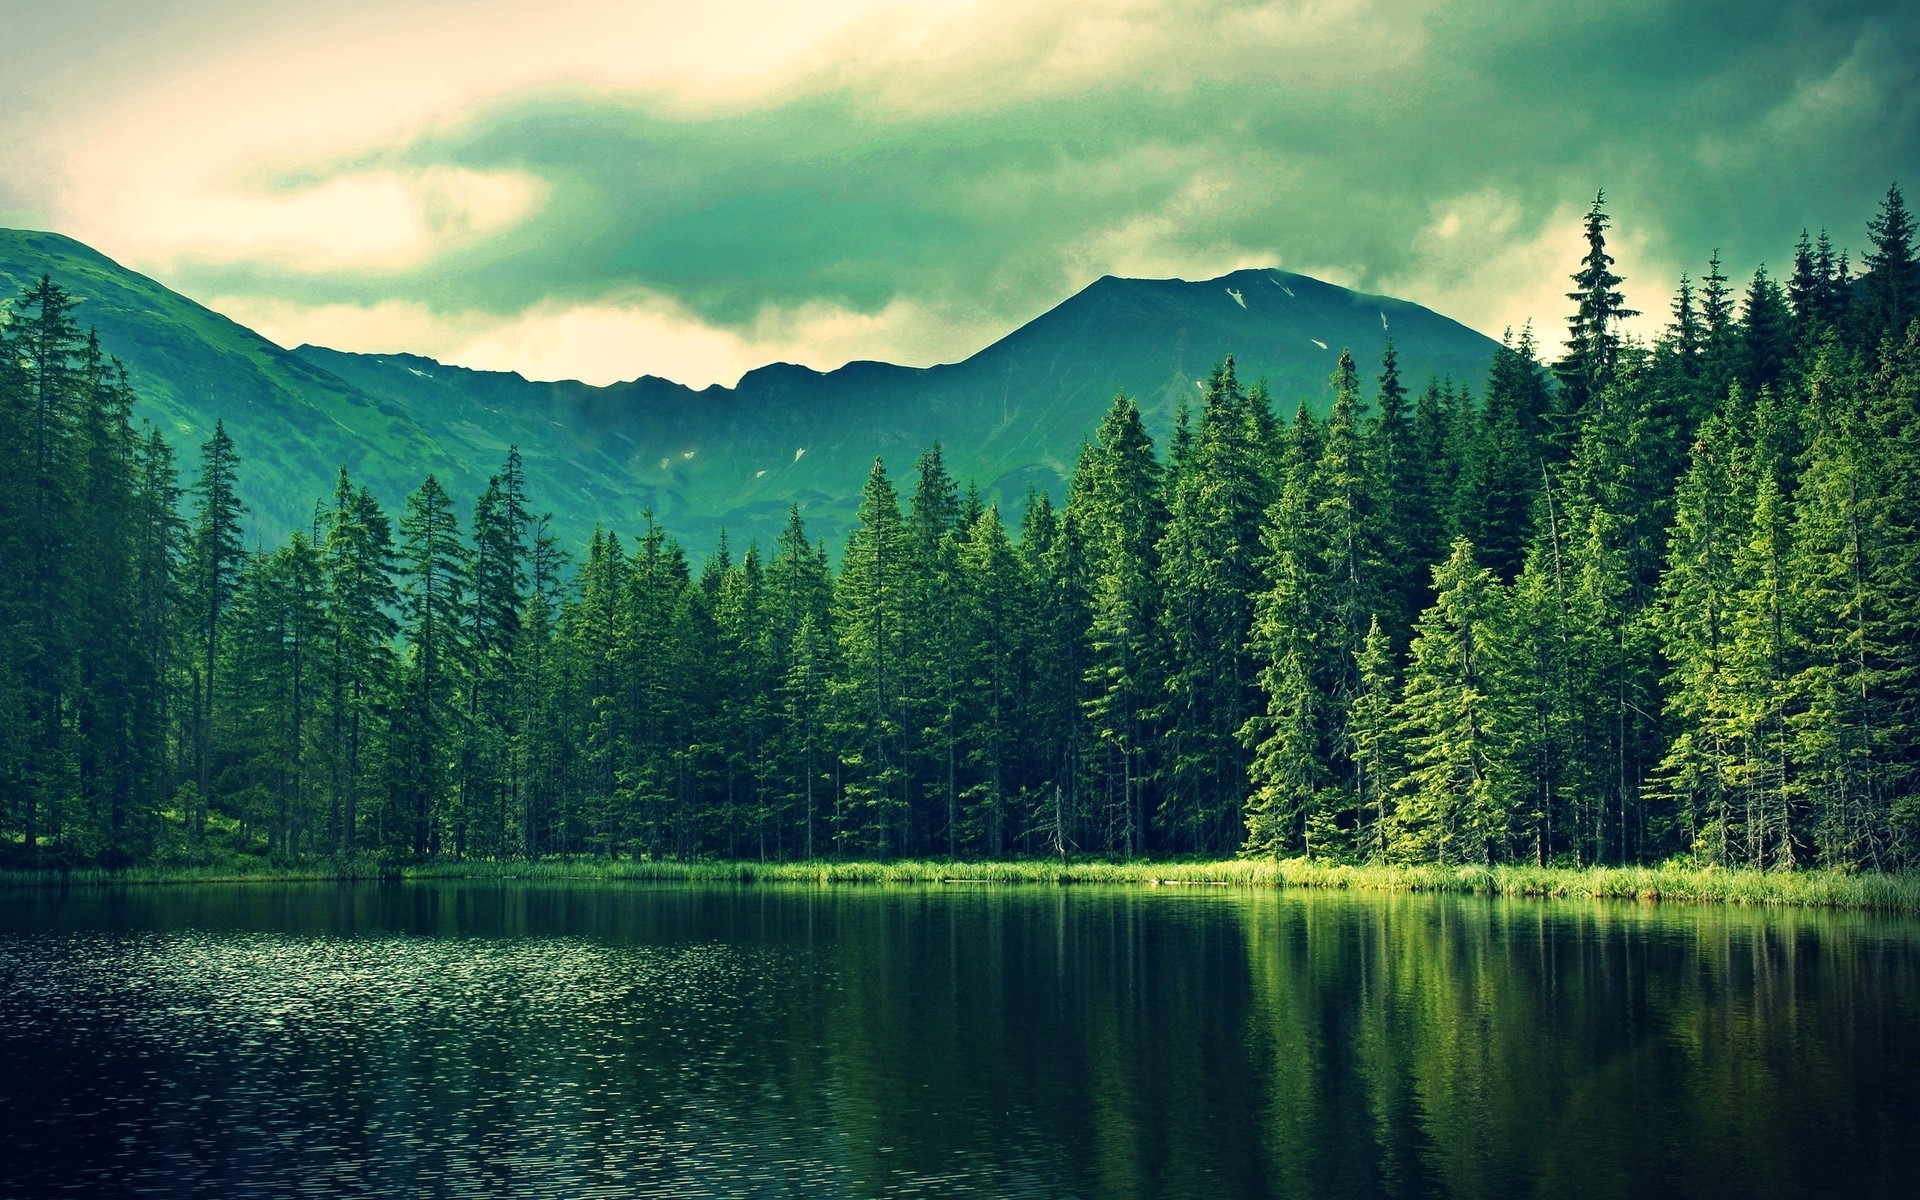 forest hd wallpaper ·①